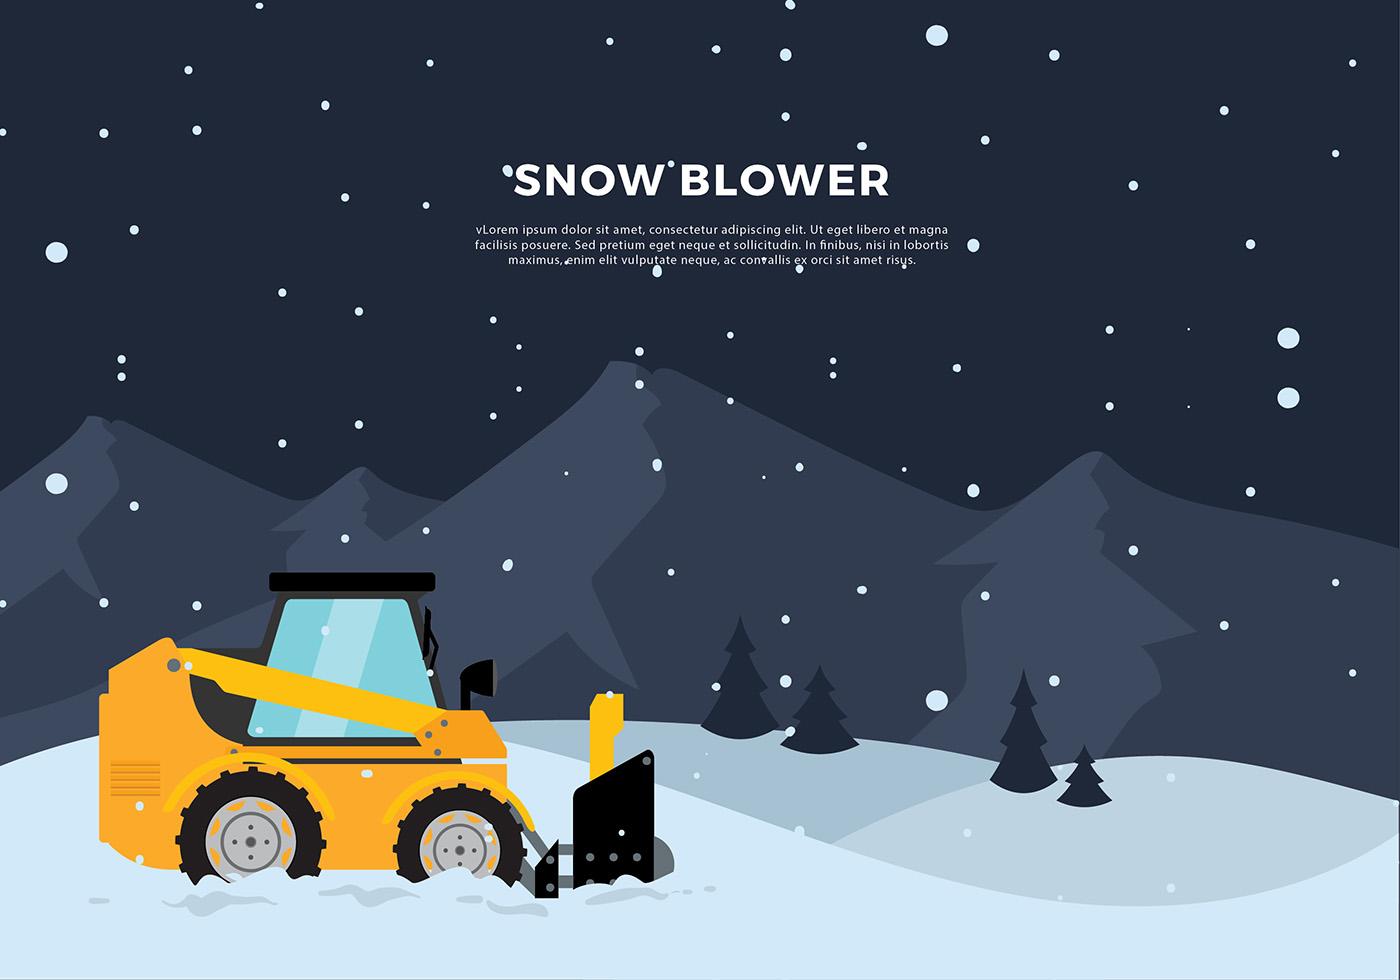 Snow Blower Tractor Free Vector Download Free Vectors